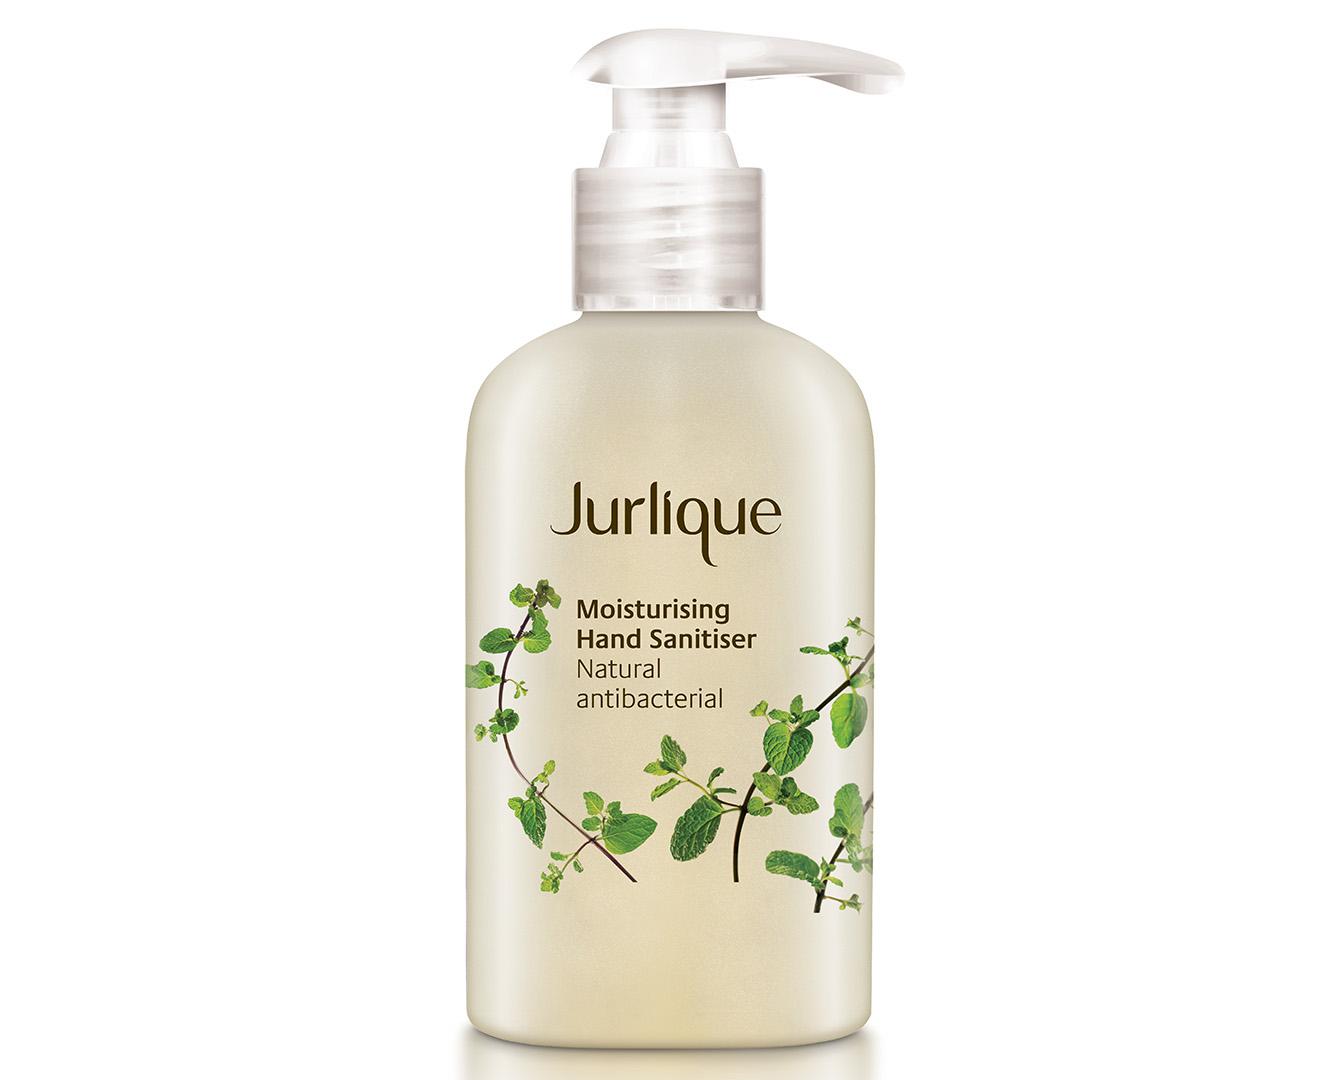 Jurlique Moisturising Hand Sanitiser 175ml Dettol Sanitizer Original 50 Ml 4 Pcs